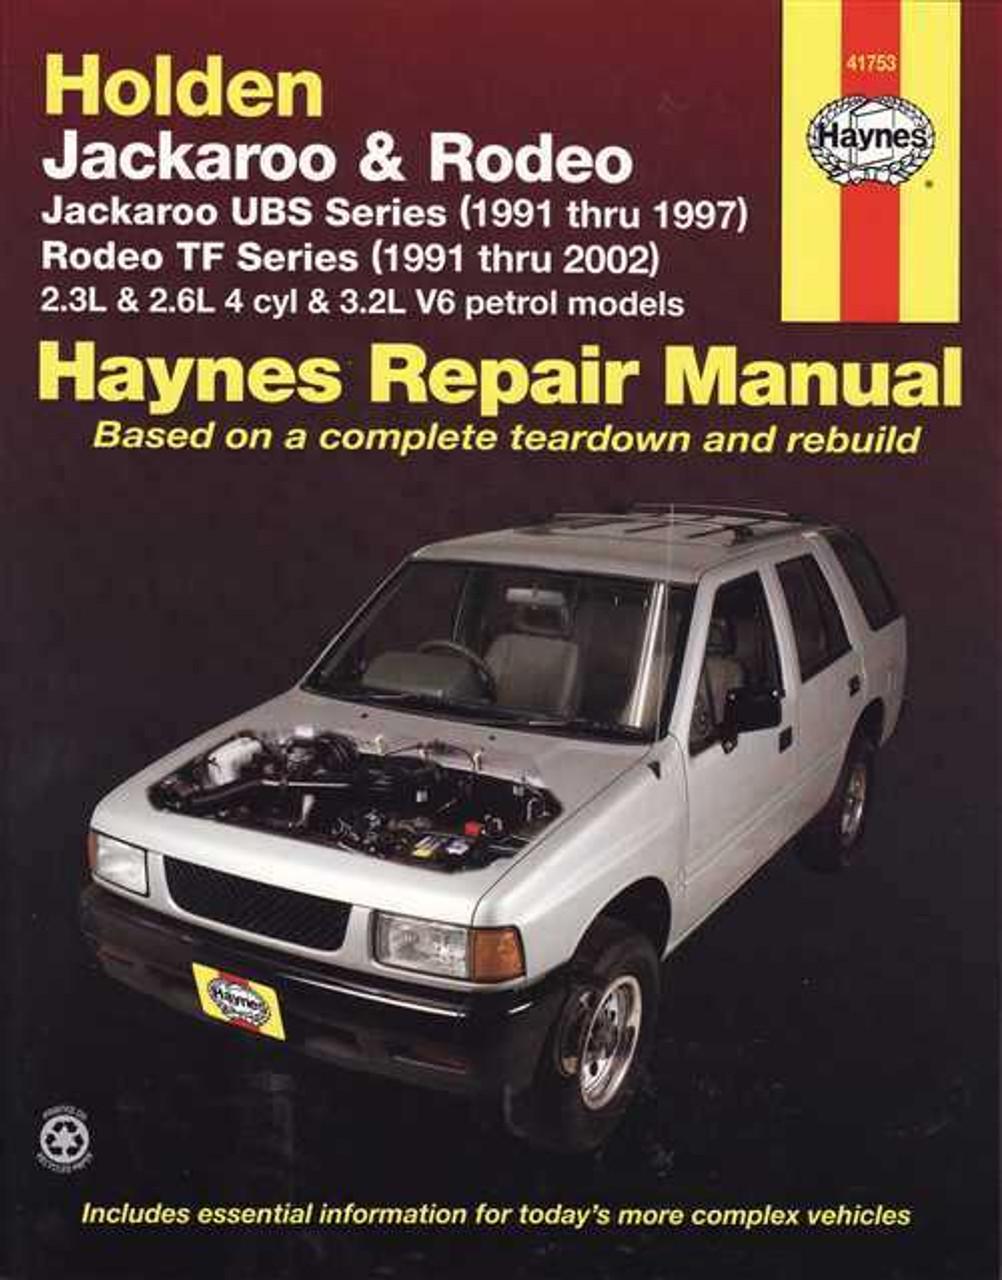 holden jackaroo amp rodeo 1991 2002 workshop manual rh automotobookshop com au Holden Jackaroo Monterey White Holden Jackaroo